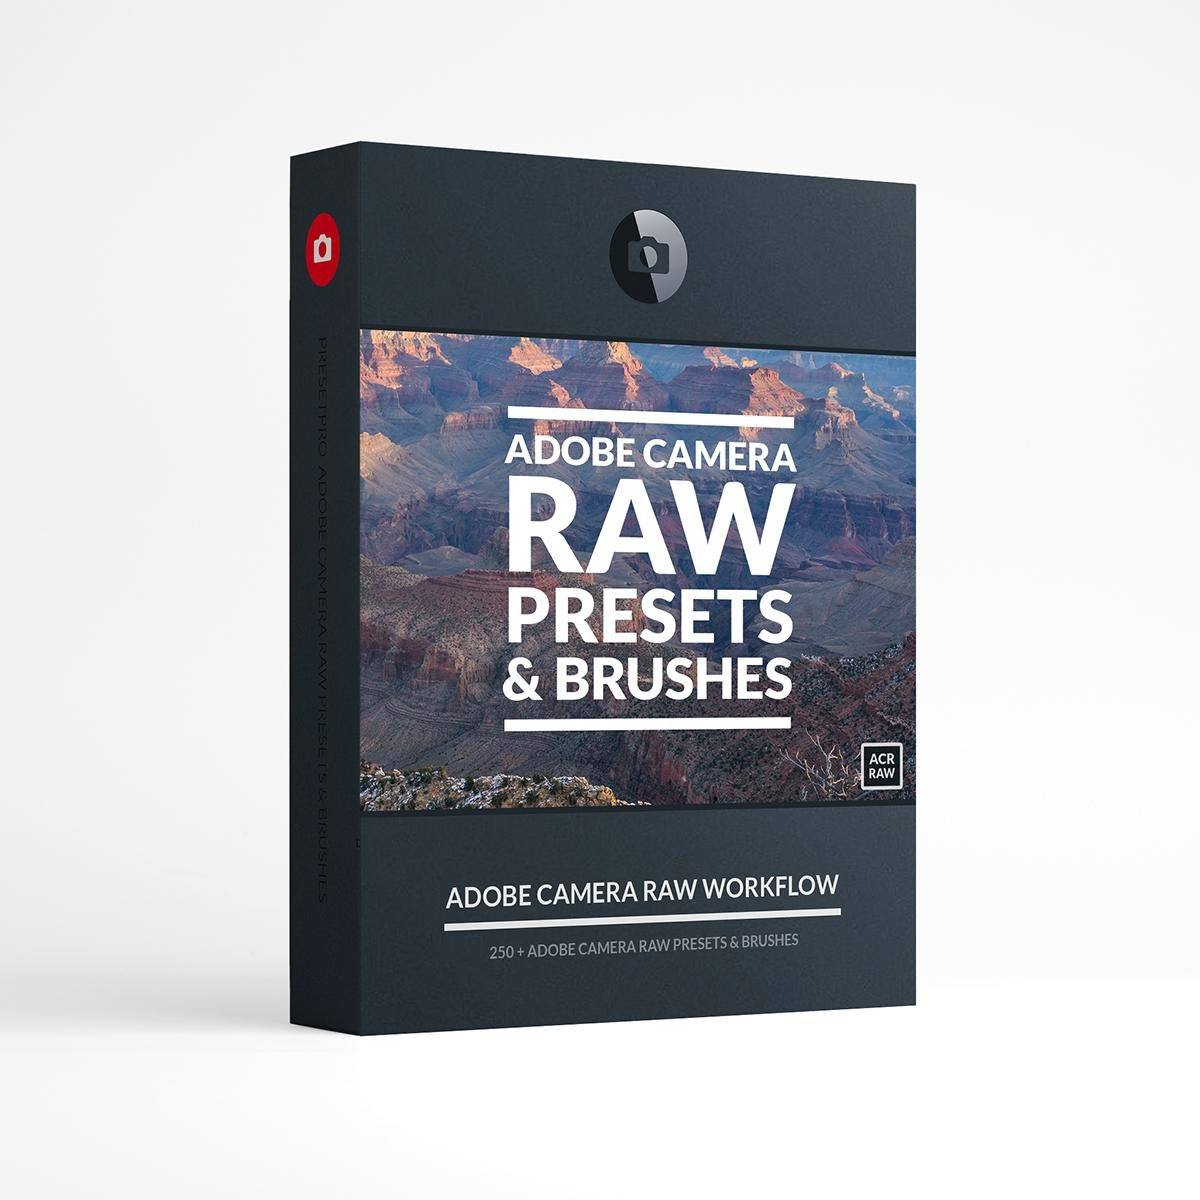 Presetpro-Adobe-Camera-RAW-Presets-and-Brushes